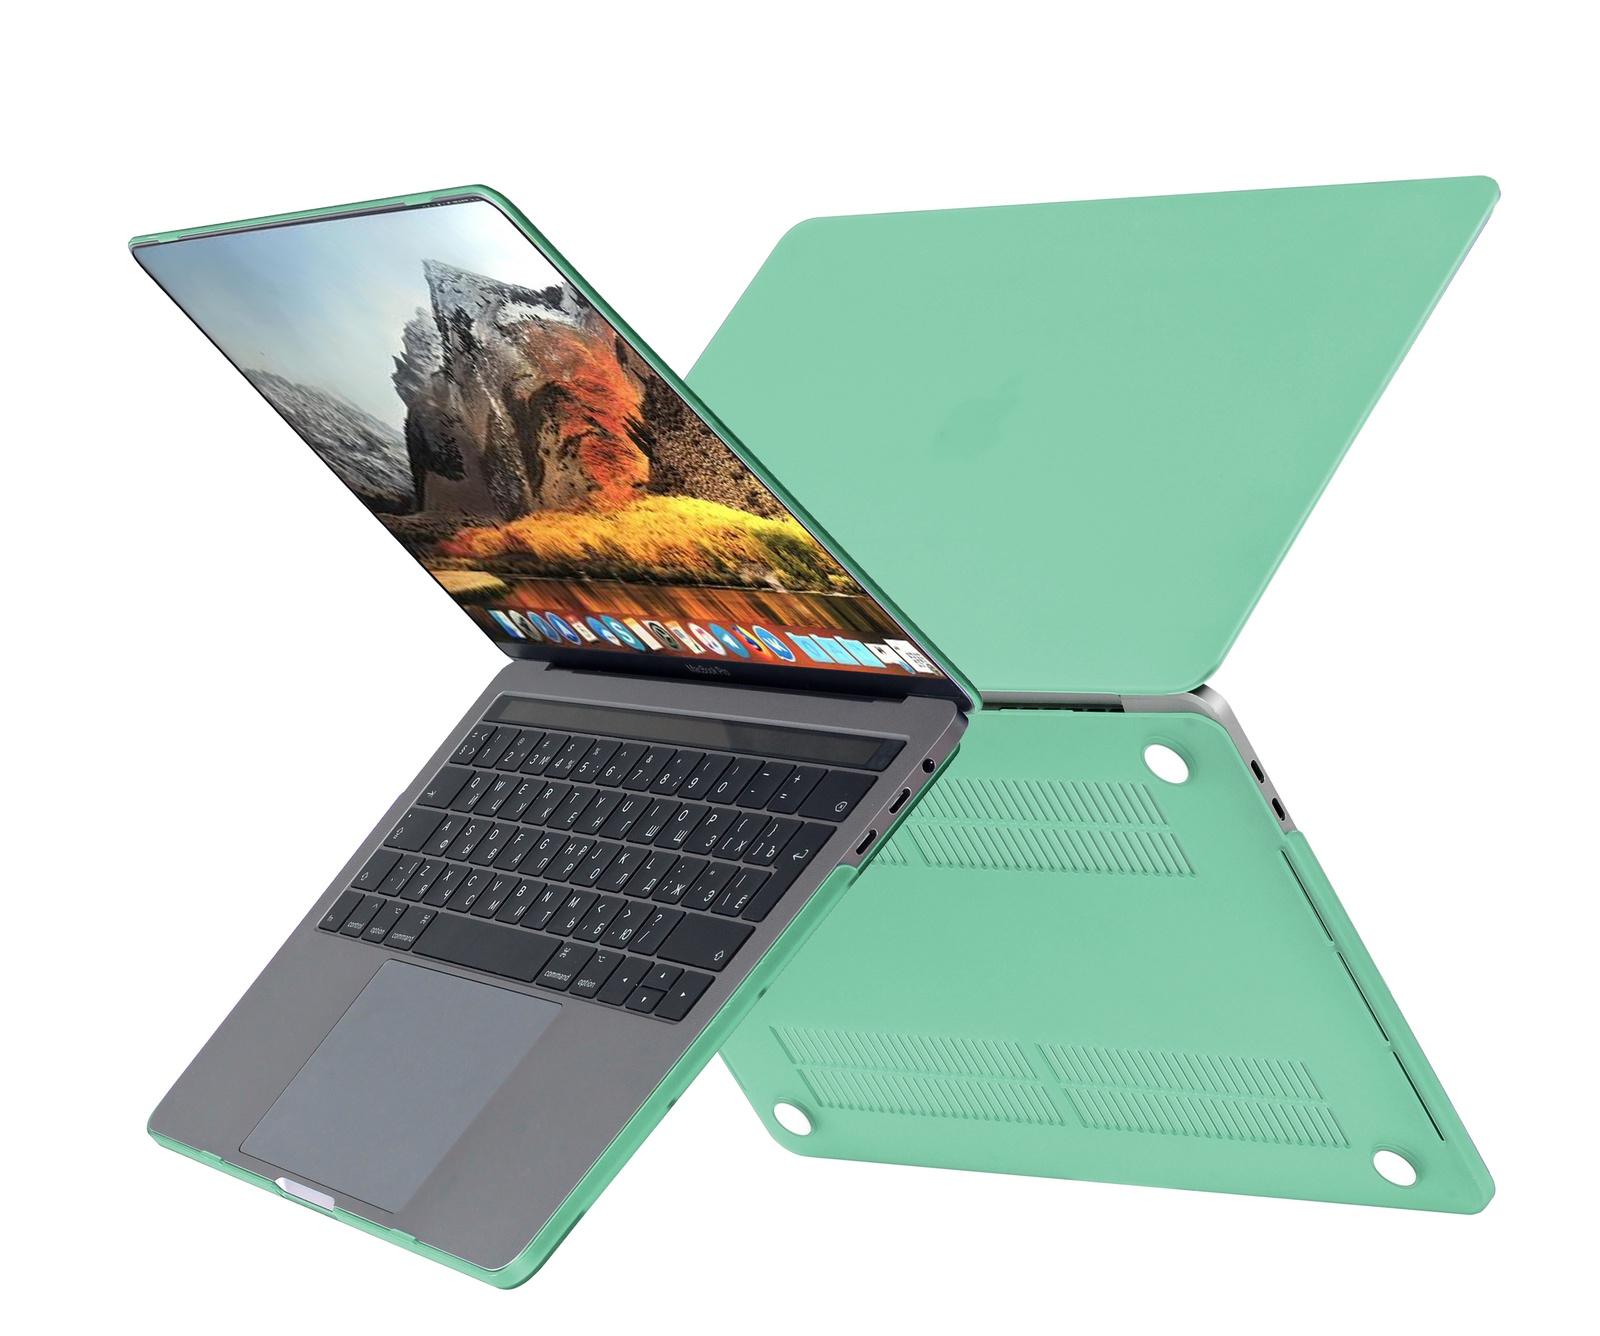 Чехол HardShell Case для Macbook 12, светло зеленый